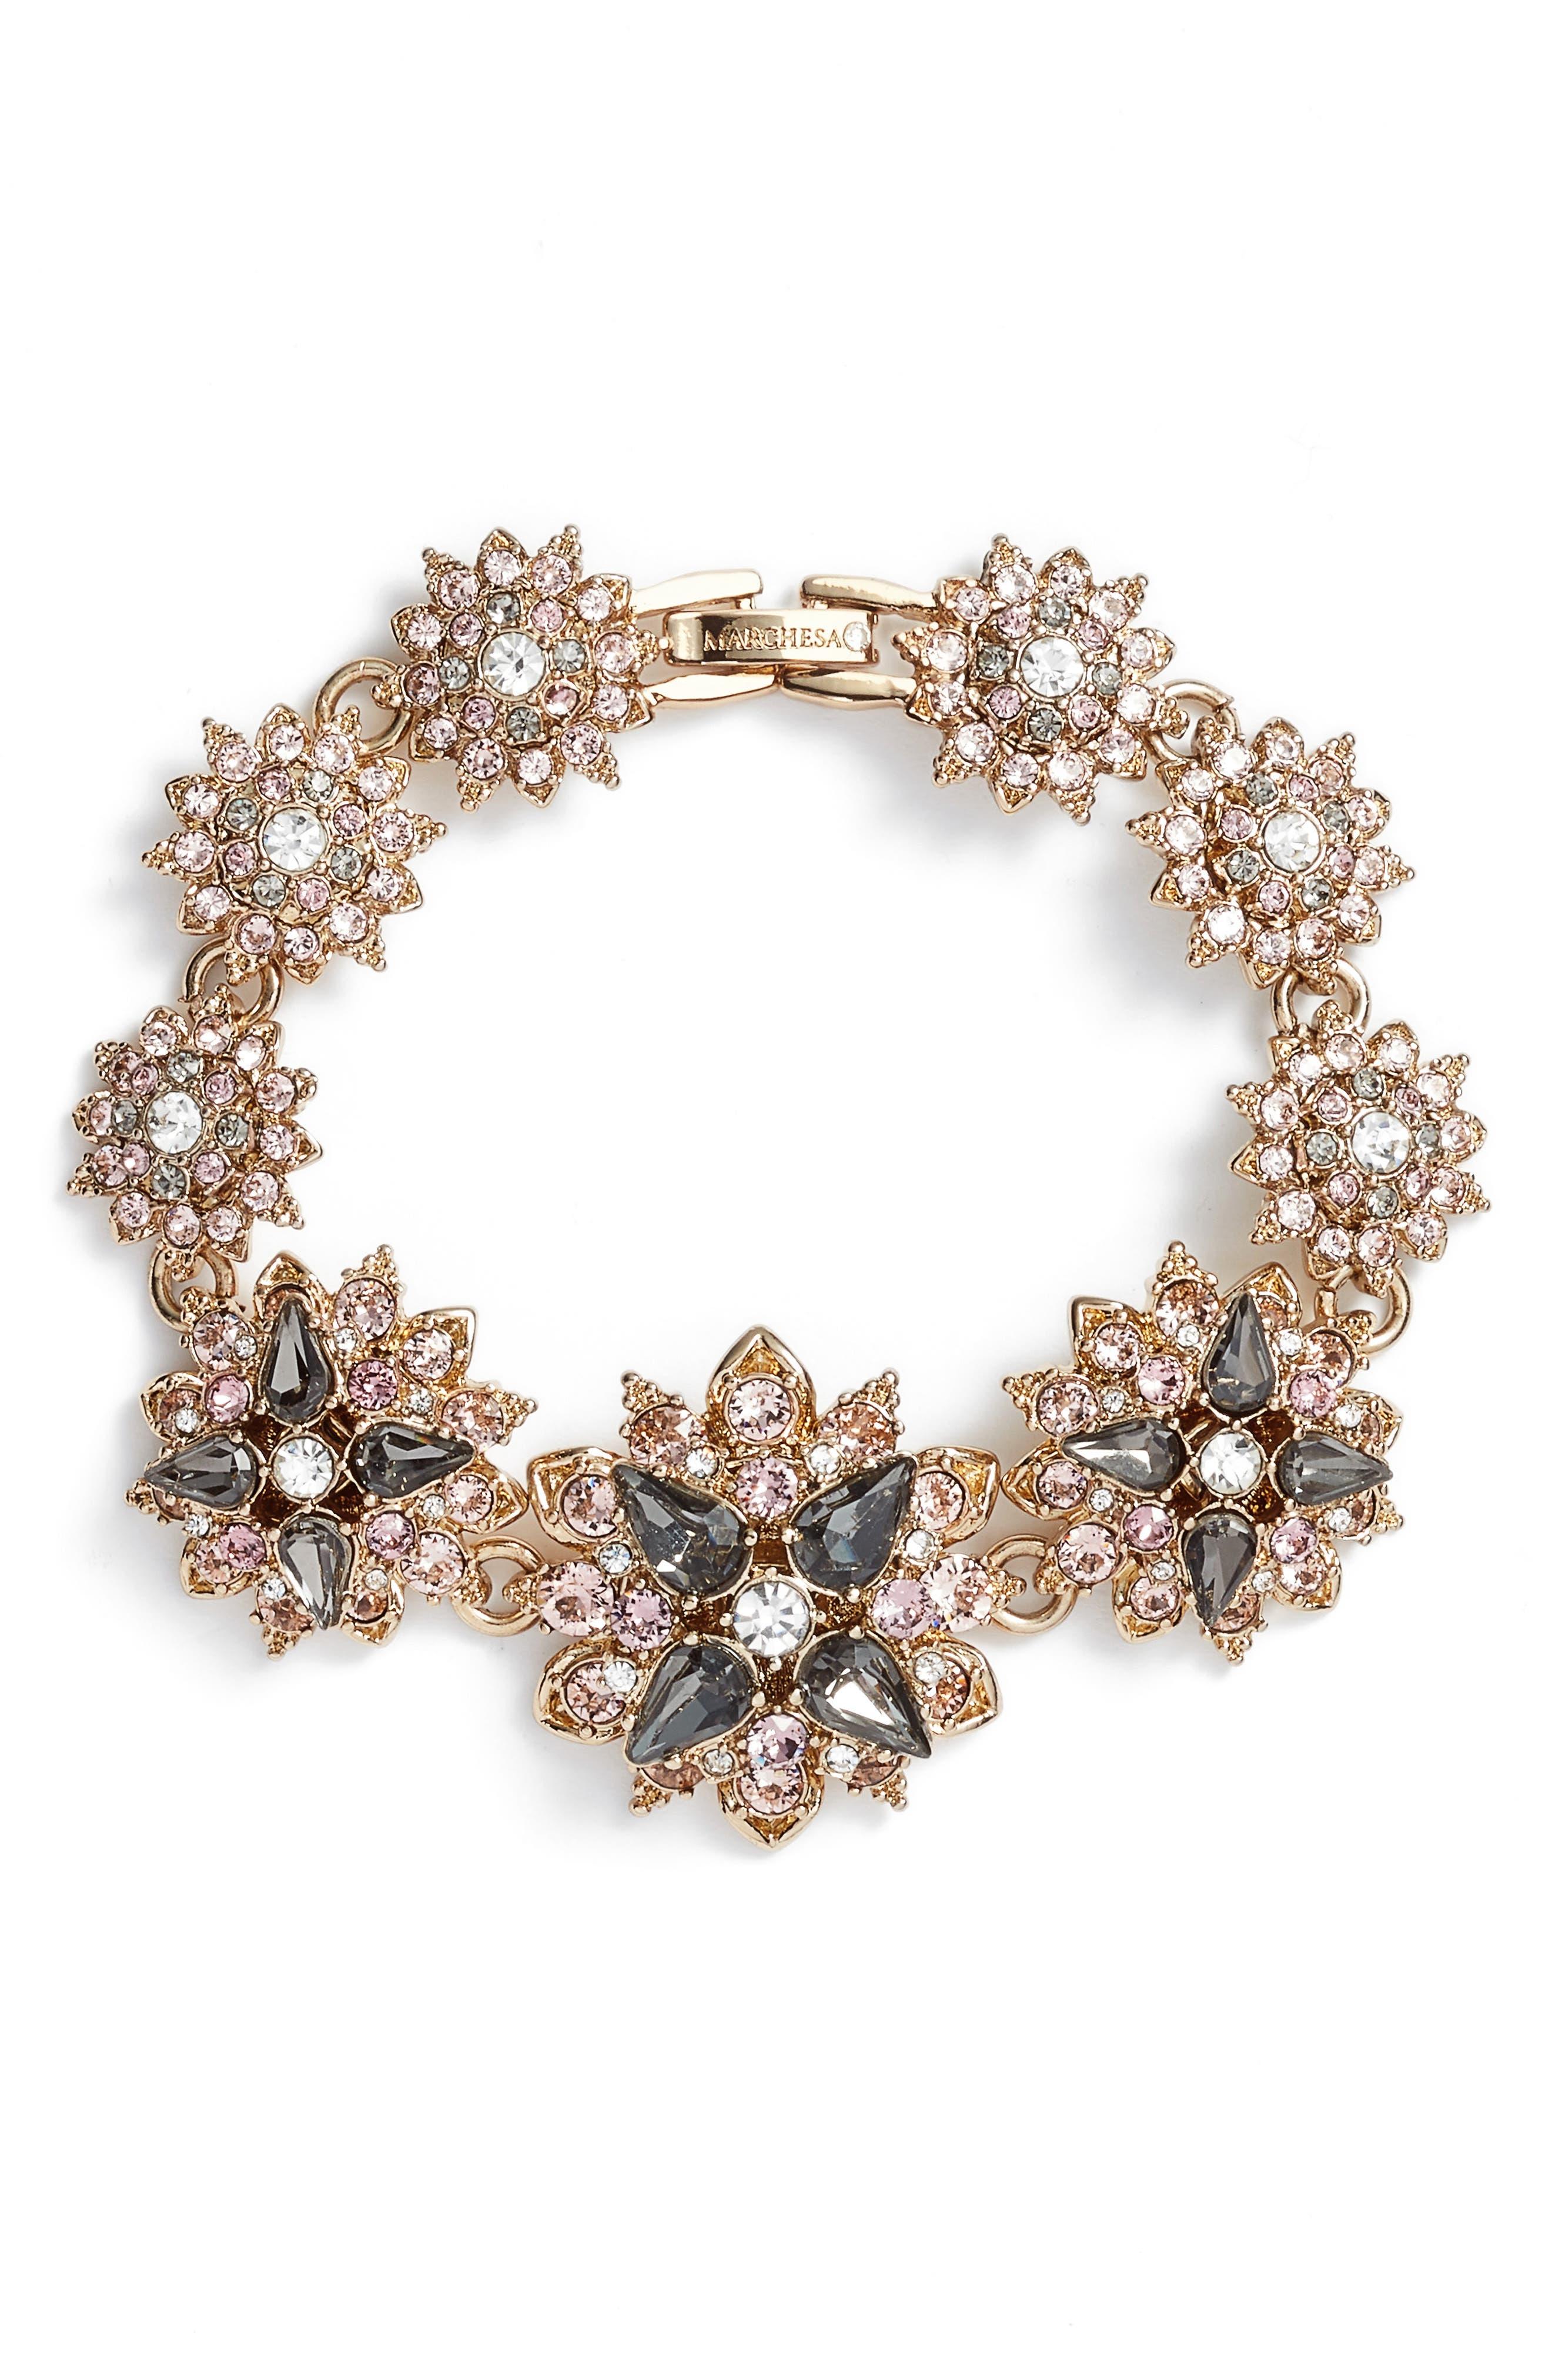 Main Image - Marchesa Crystal Bracelet